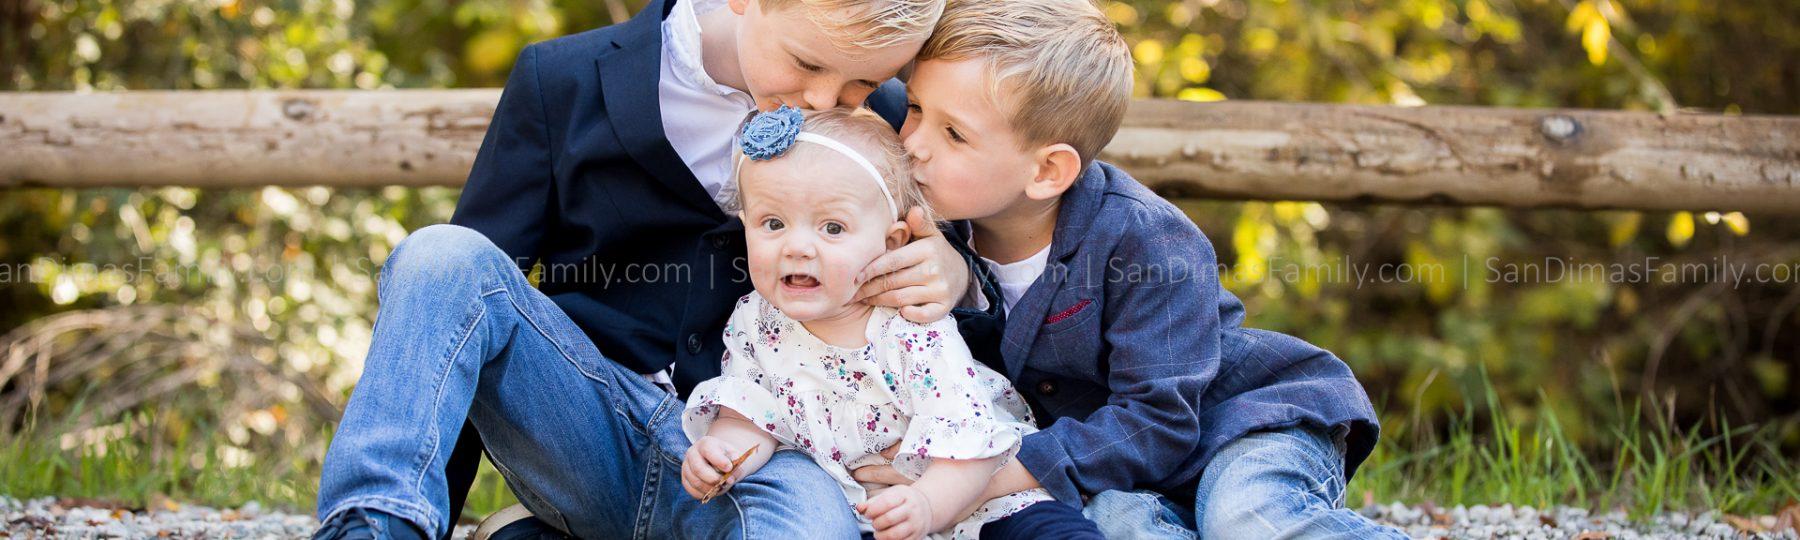 La Verne Family Photos (91750)